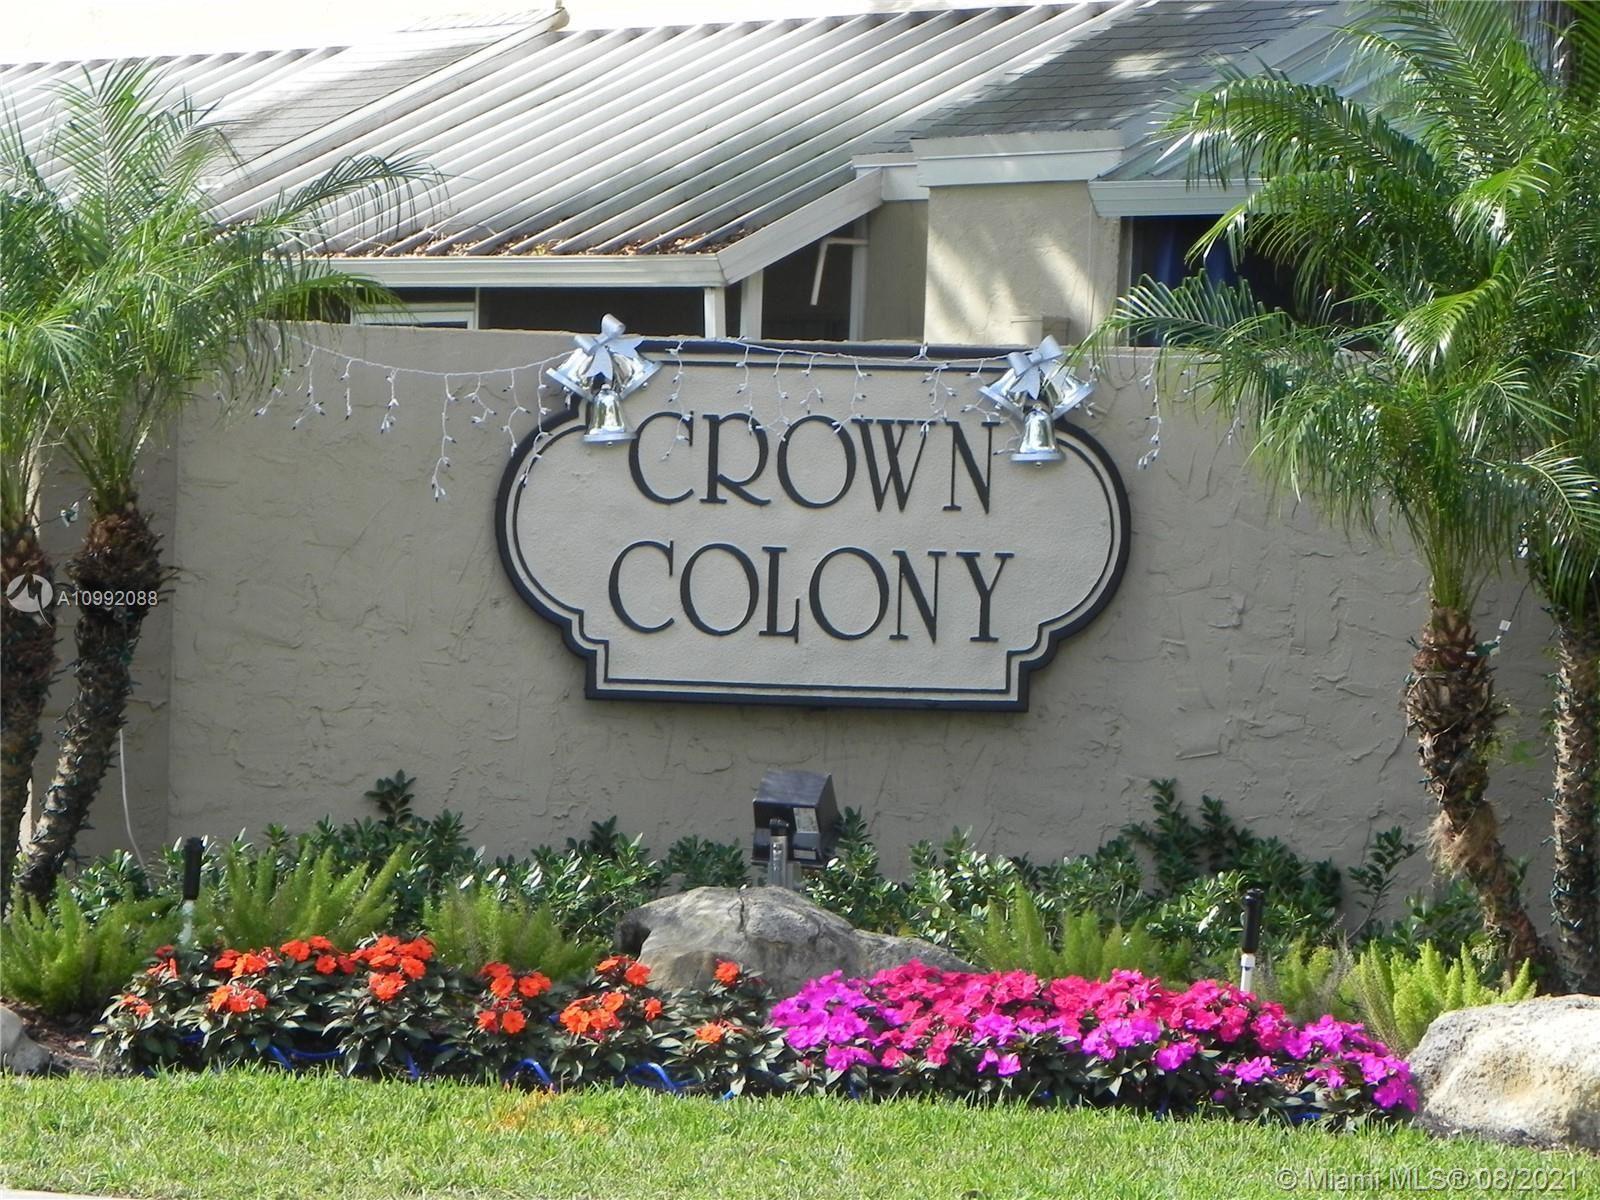 Photo of 2908 Edgehill Ln #2908, Cooper City, FL 33026 (MLS # A10992088)